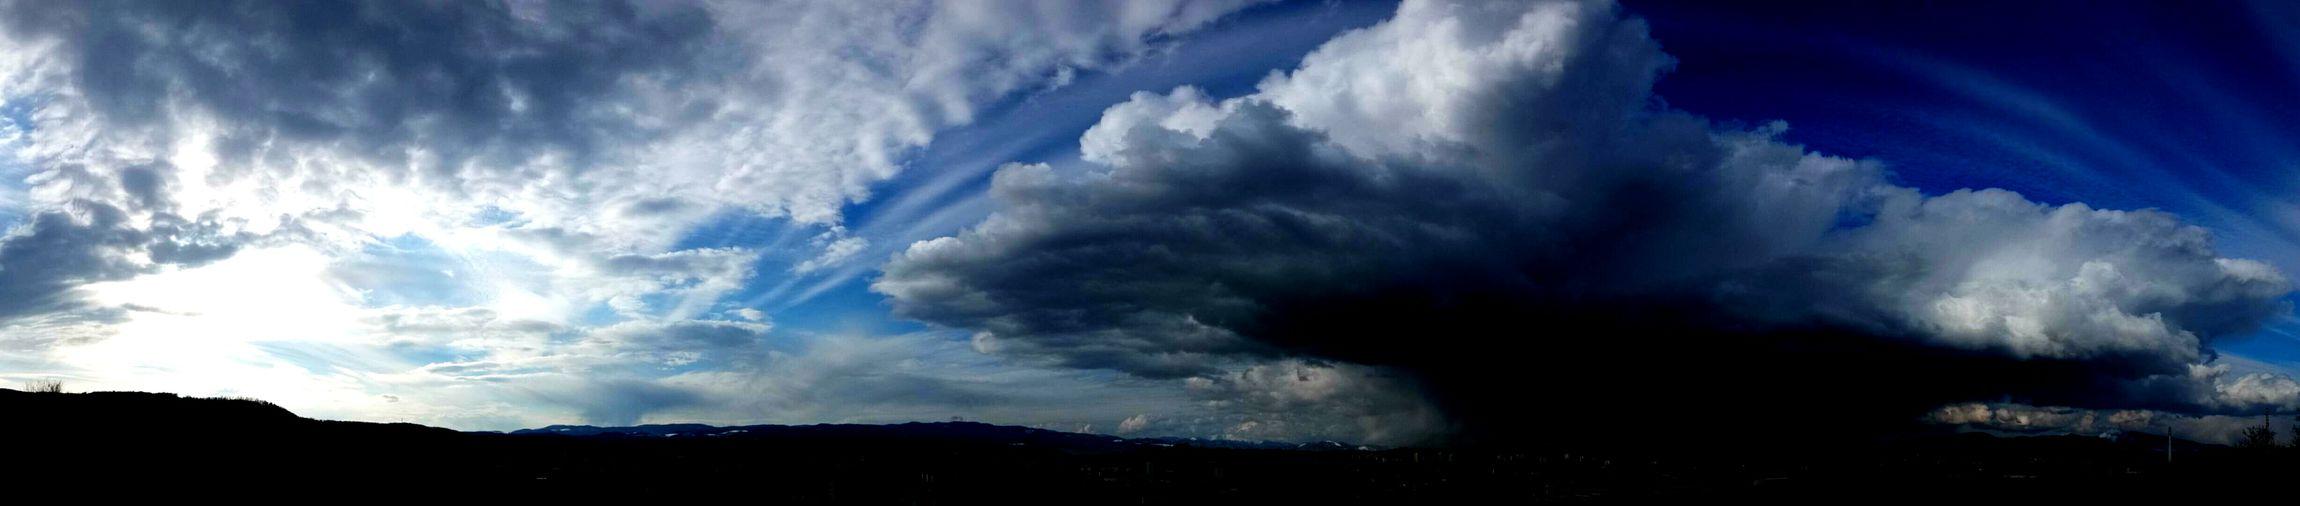 Blue Sky Clouds City